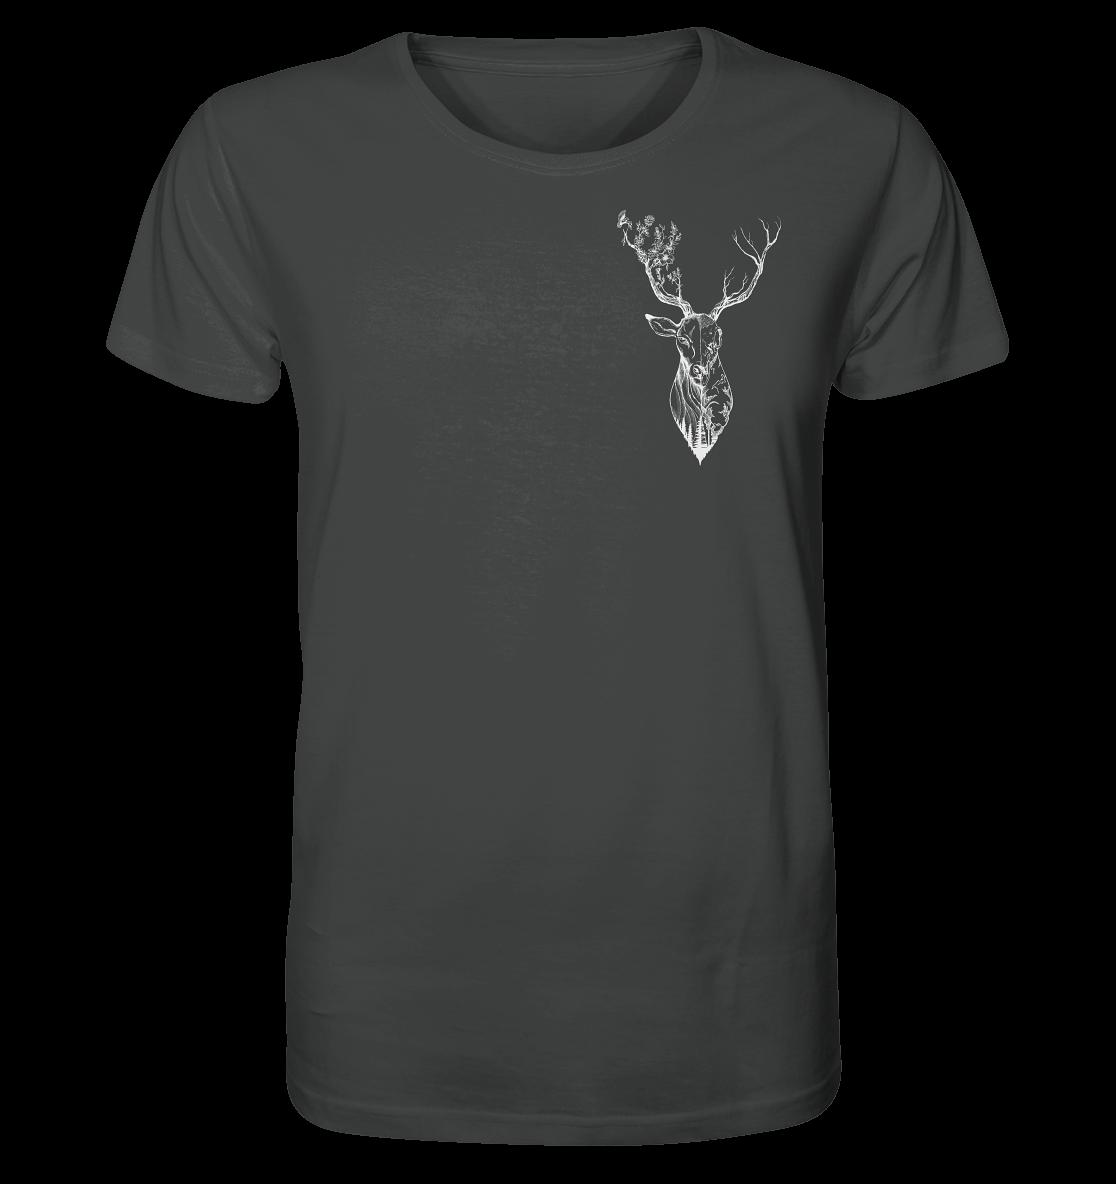 front-organic-shirt-444545-1116x-6.png